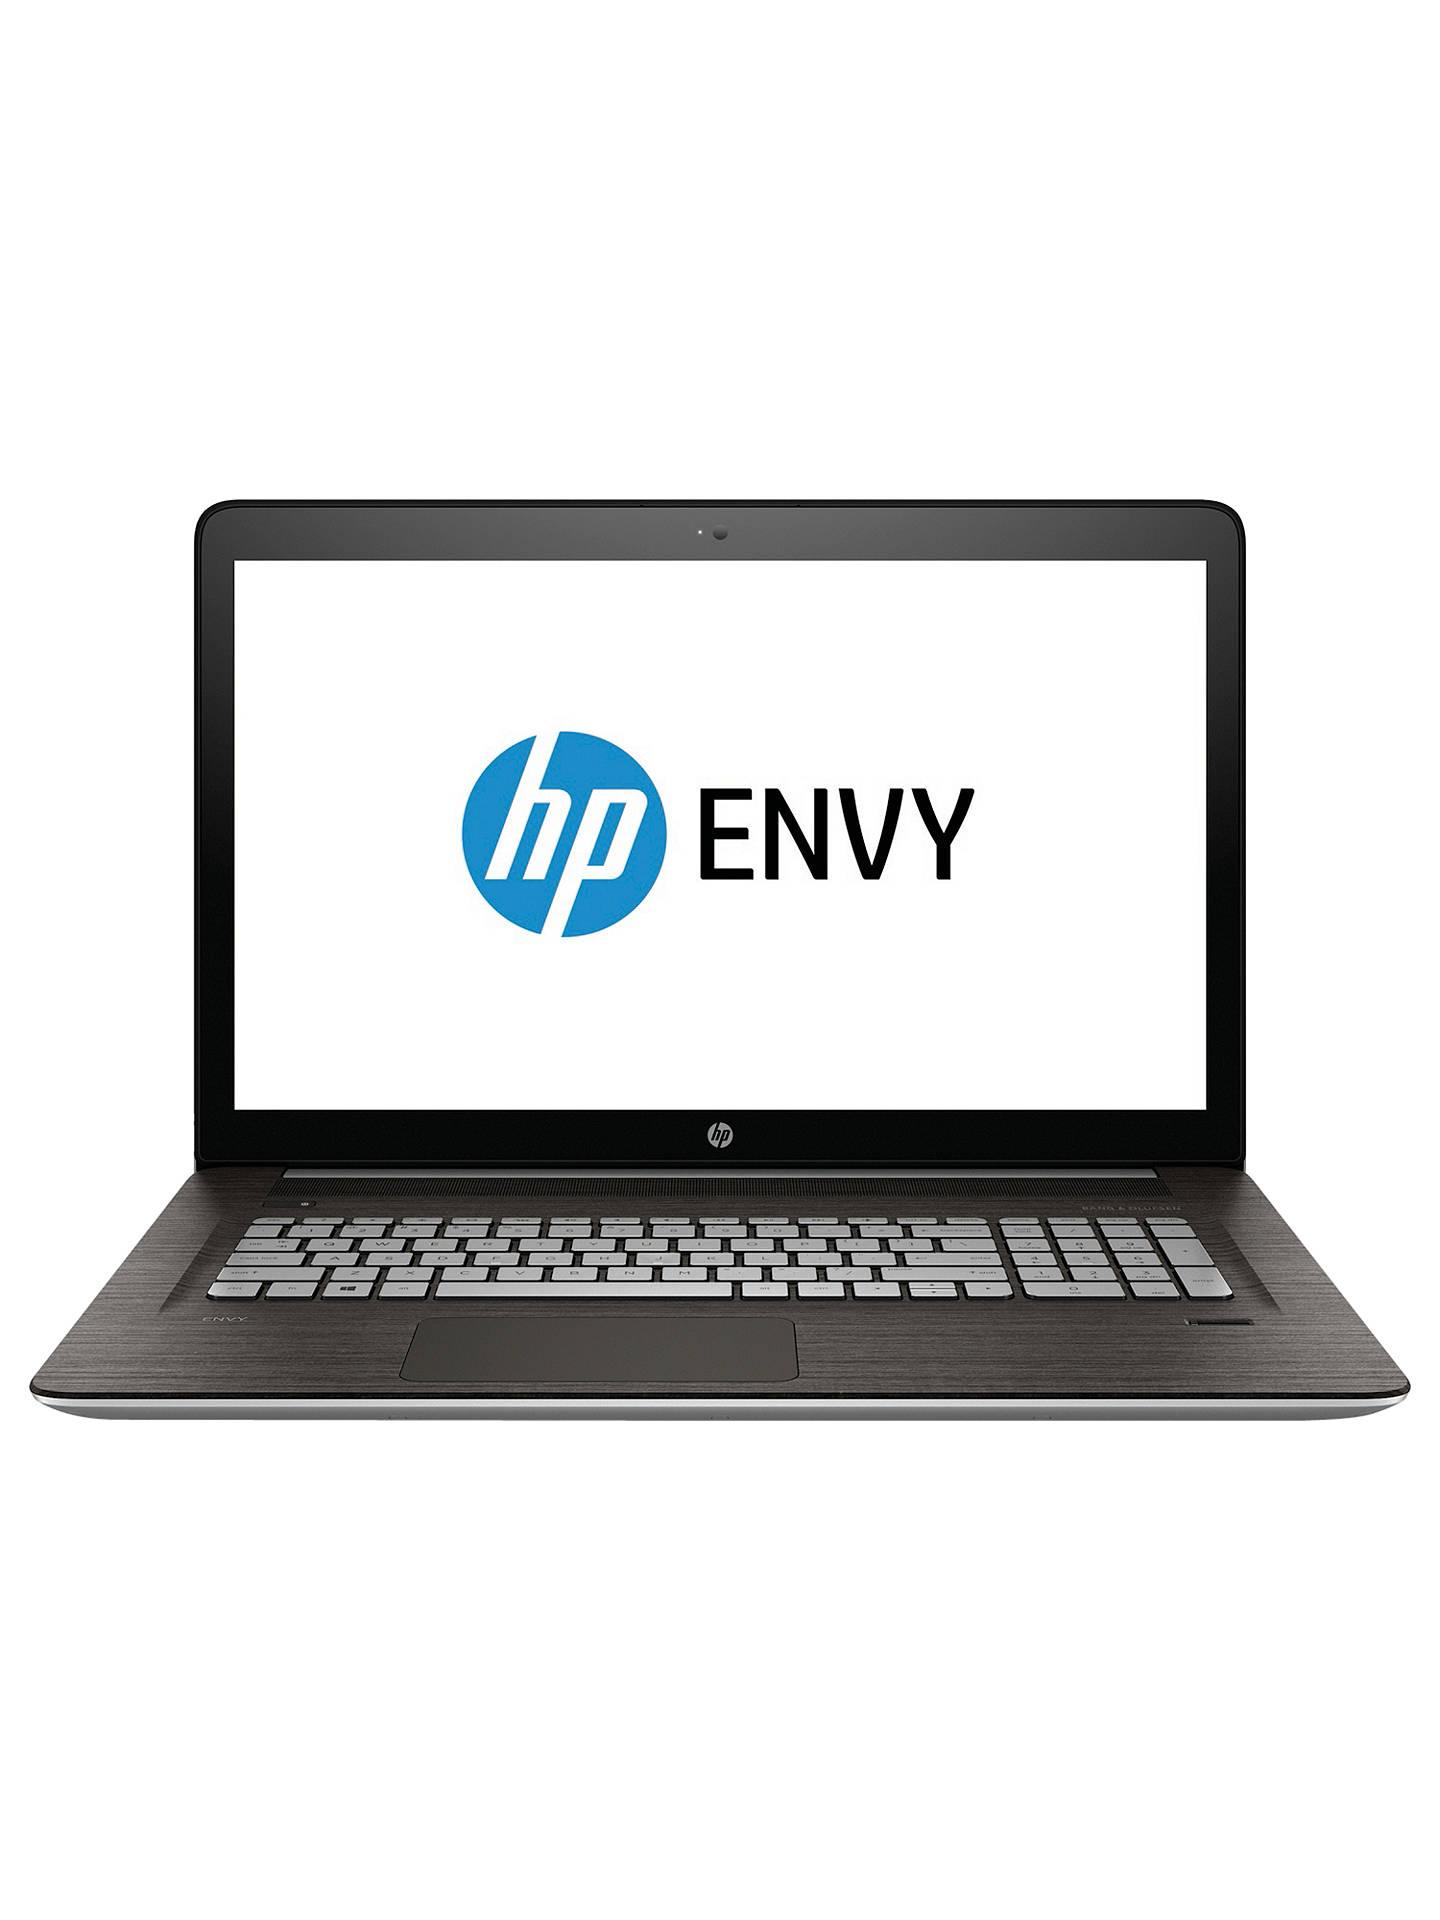 HP Envy 17-r114na Laptop, Intel Core i7, 16GB RAM, 2TB, 17 3